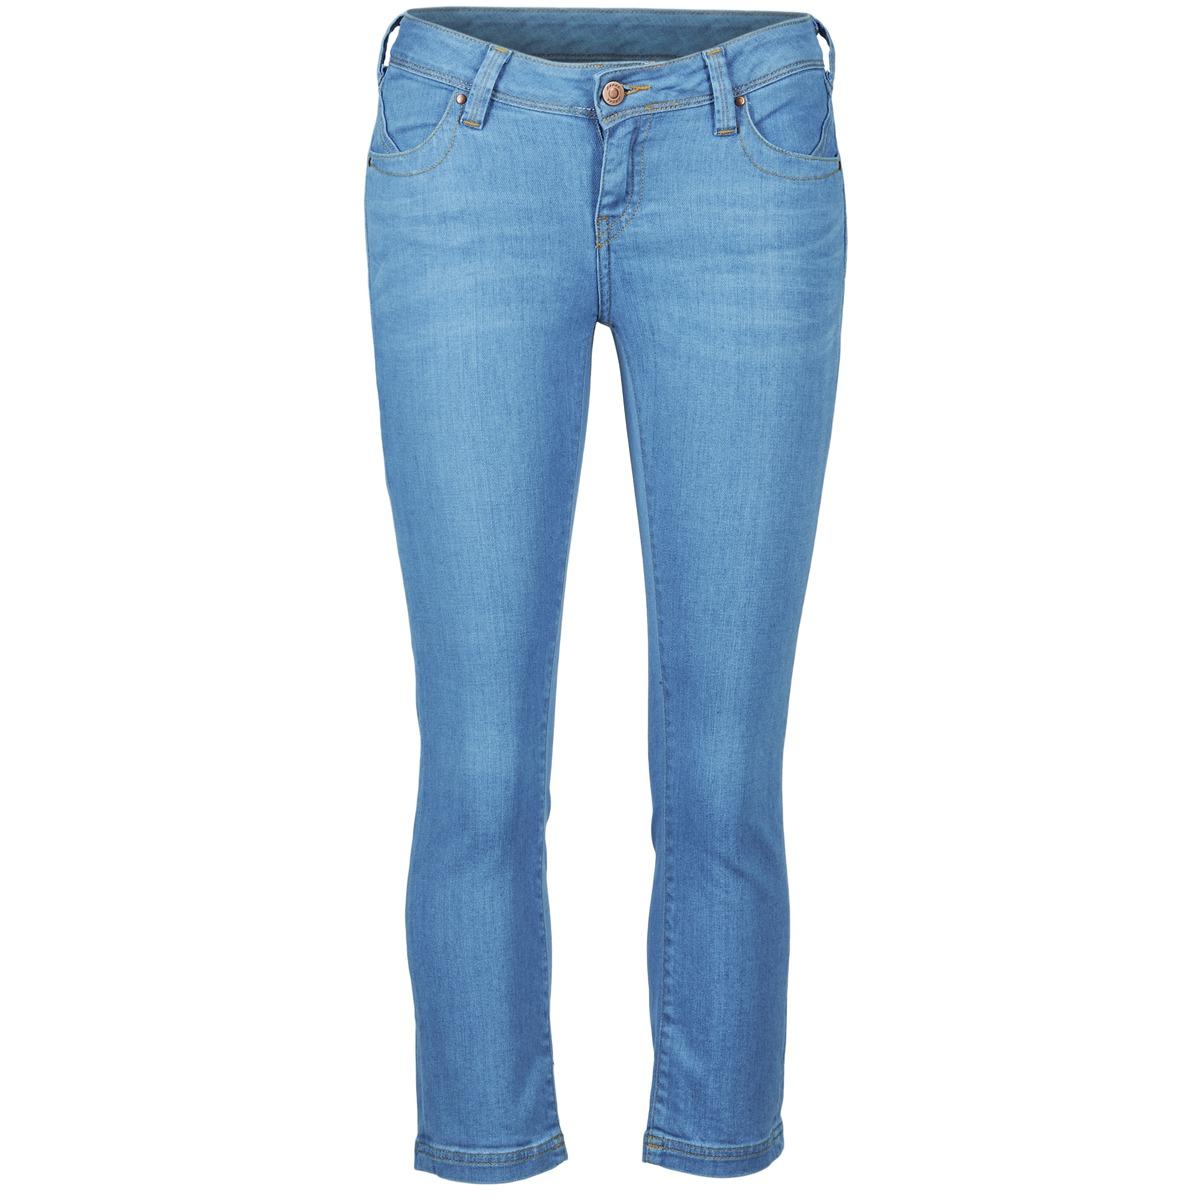 Pantalons 7/8 et 3/4 School Rag PART COURT COMF Bleu medium